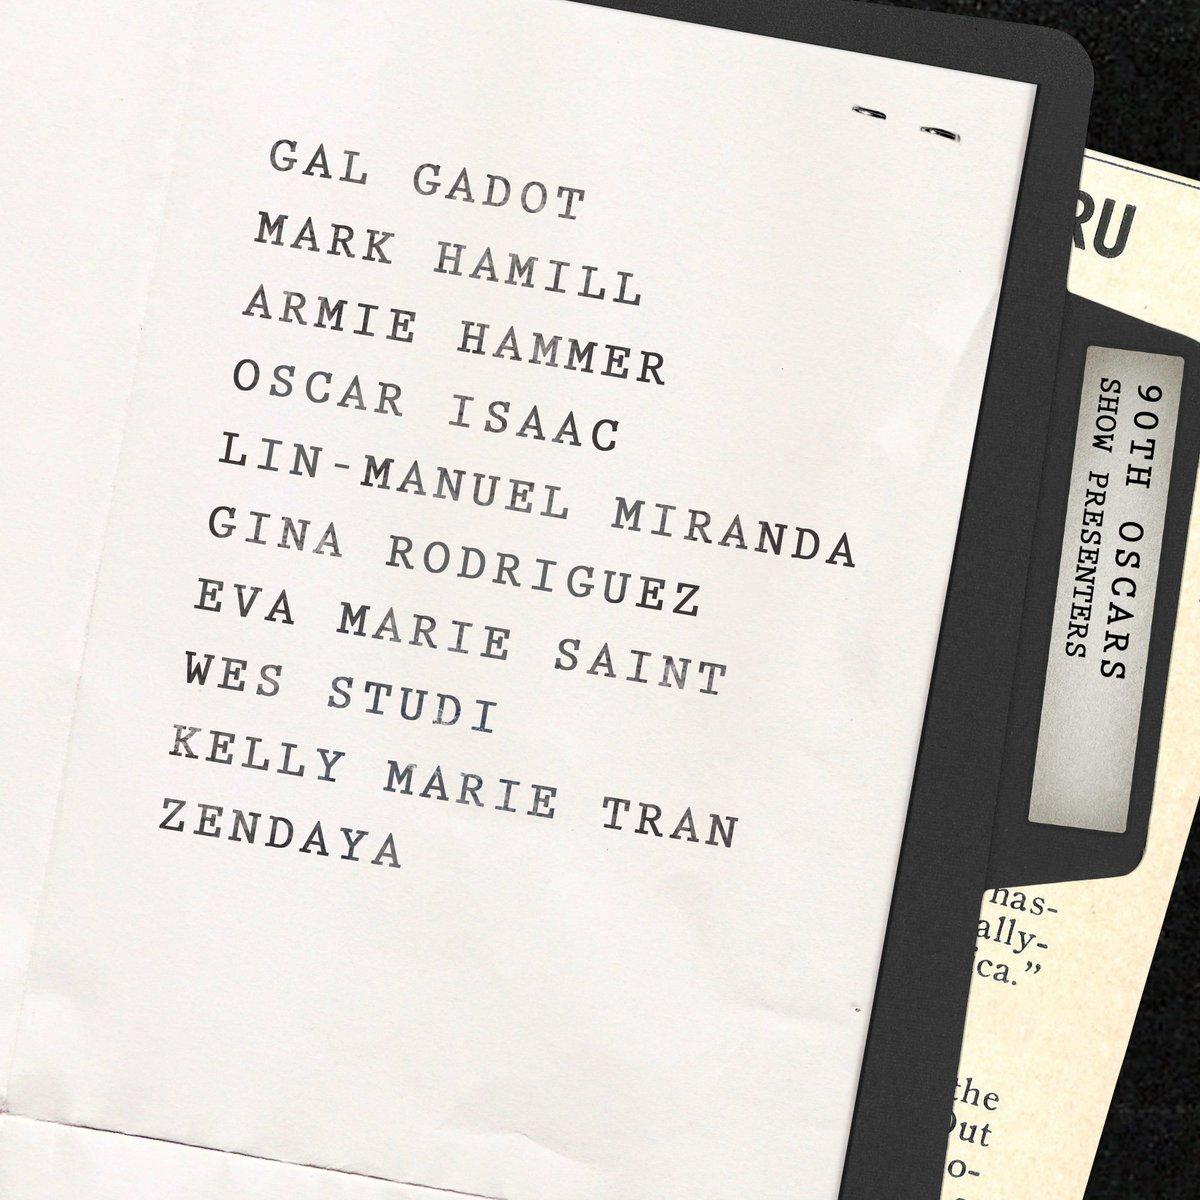 The Academy announced their next ten presenters for the #Oscars